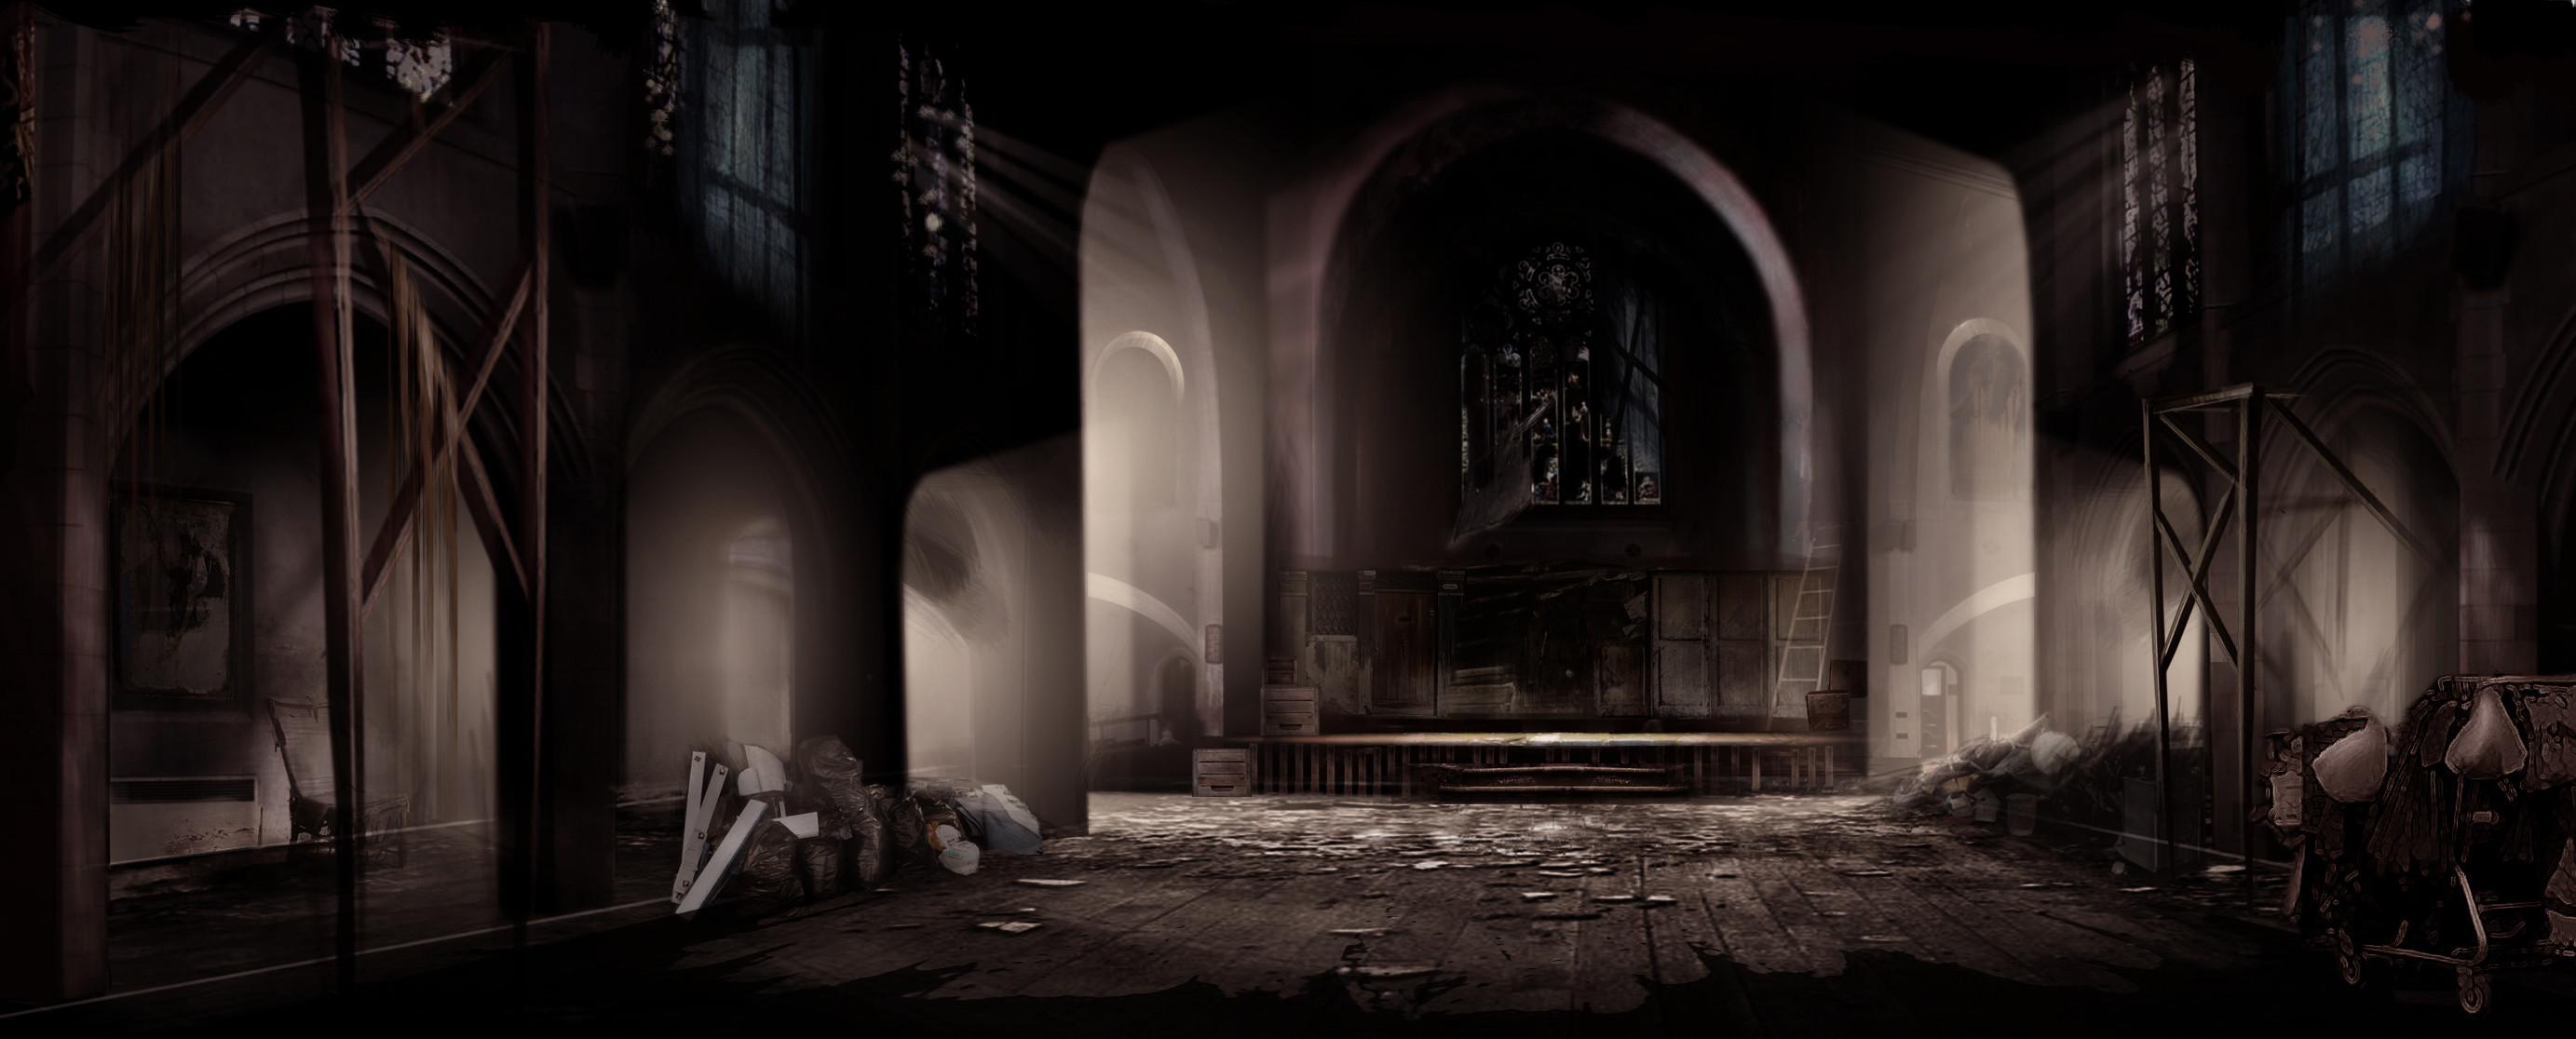 Abandoned Mutant Church for Xmen3